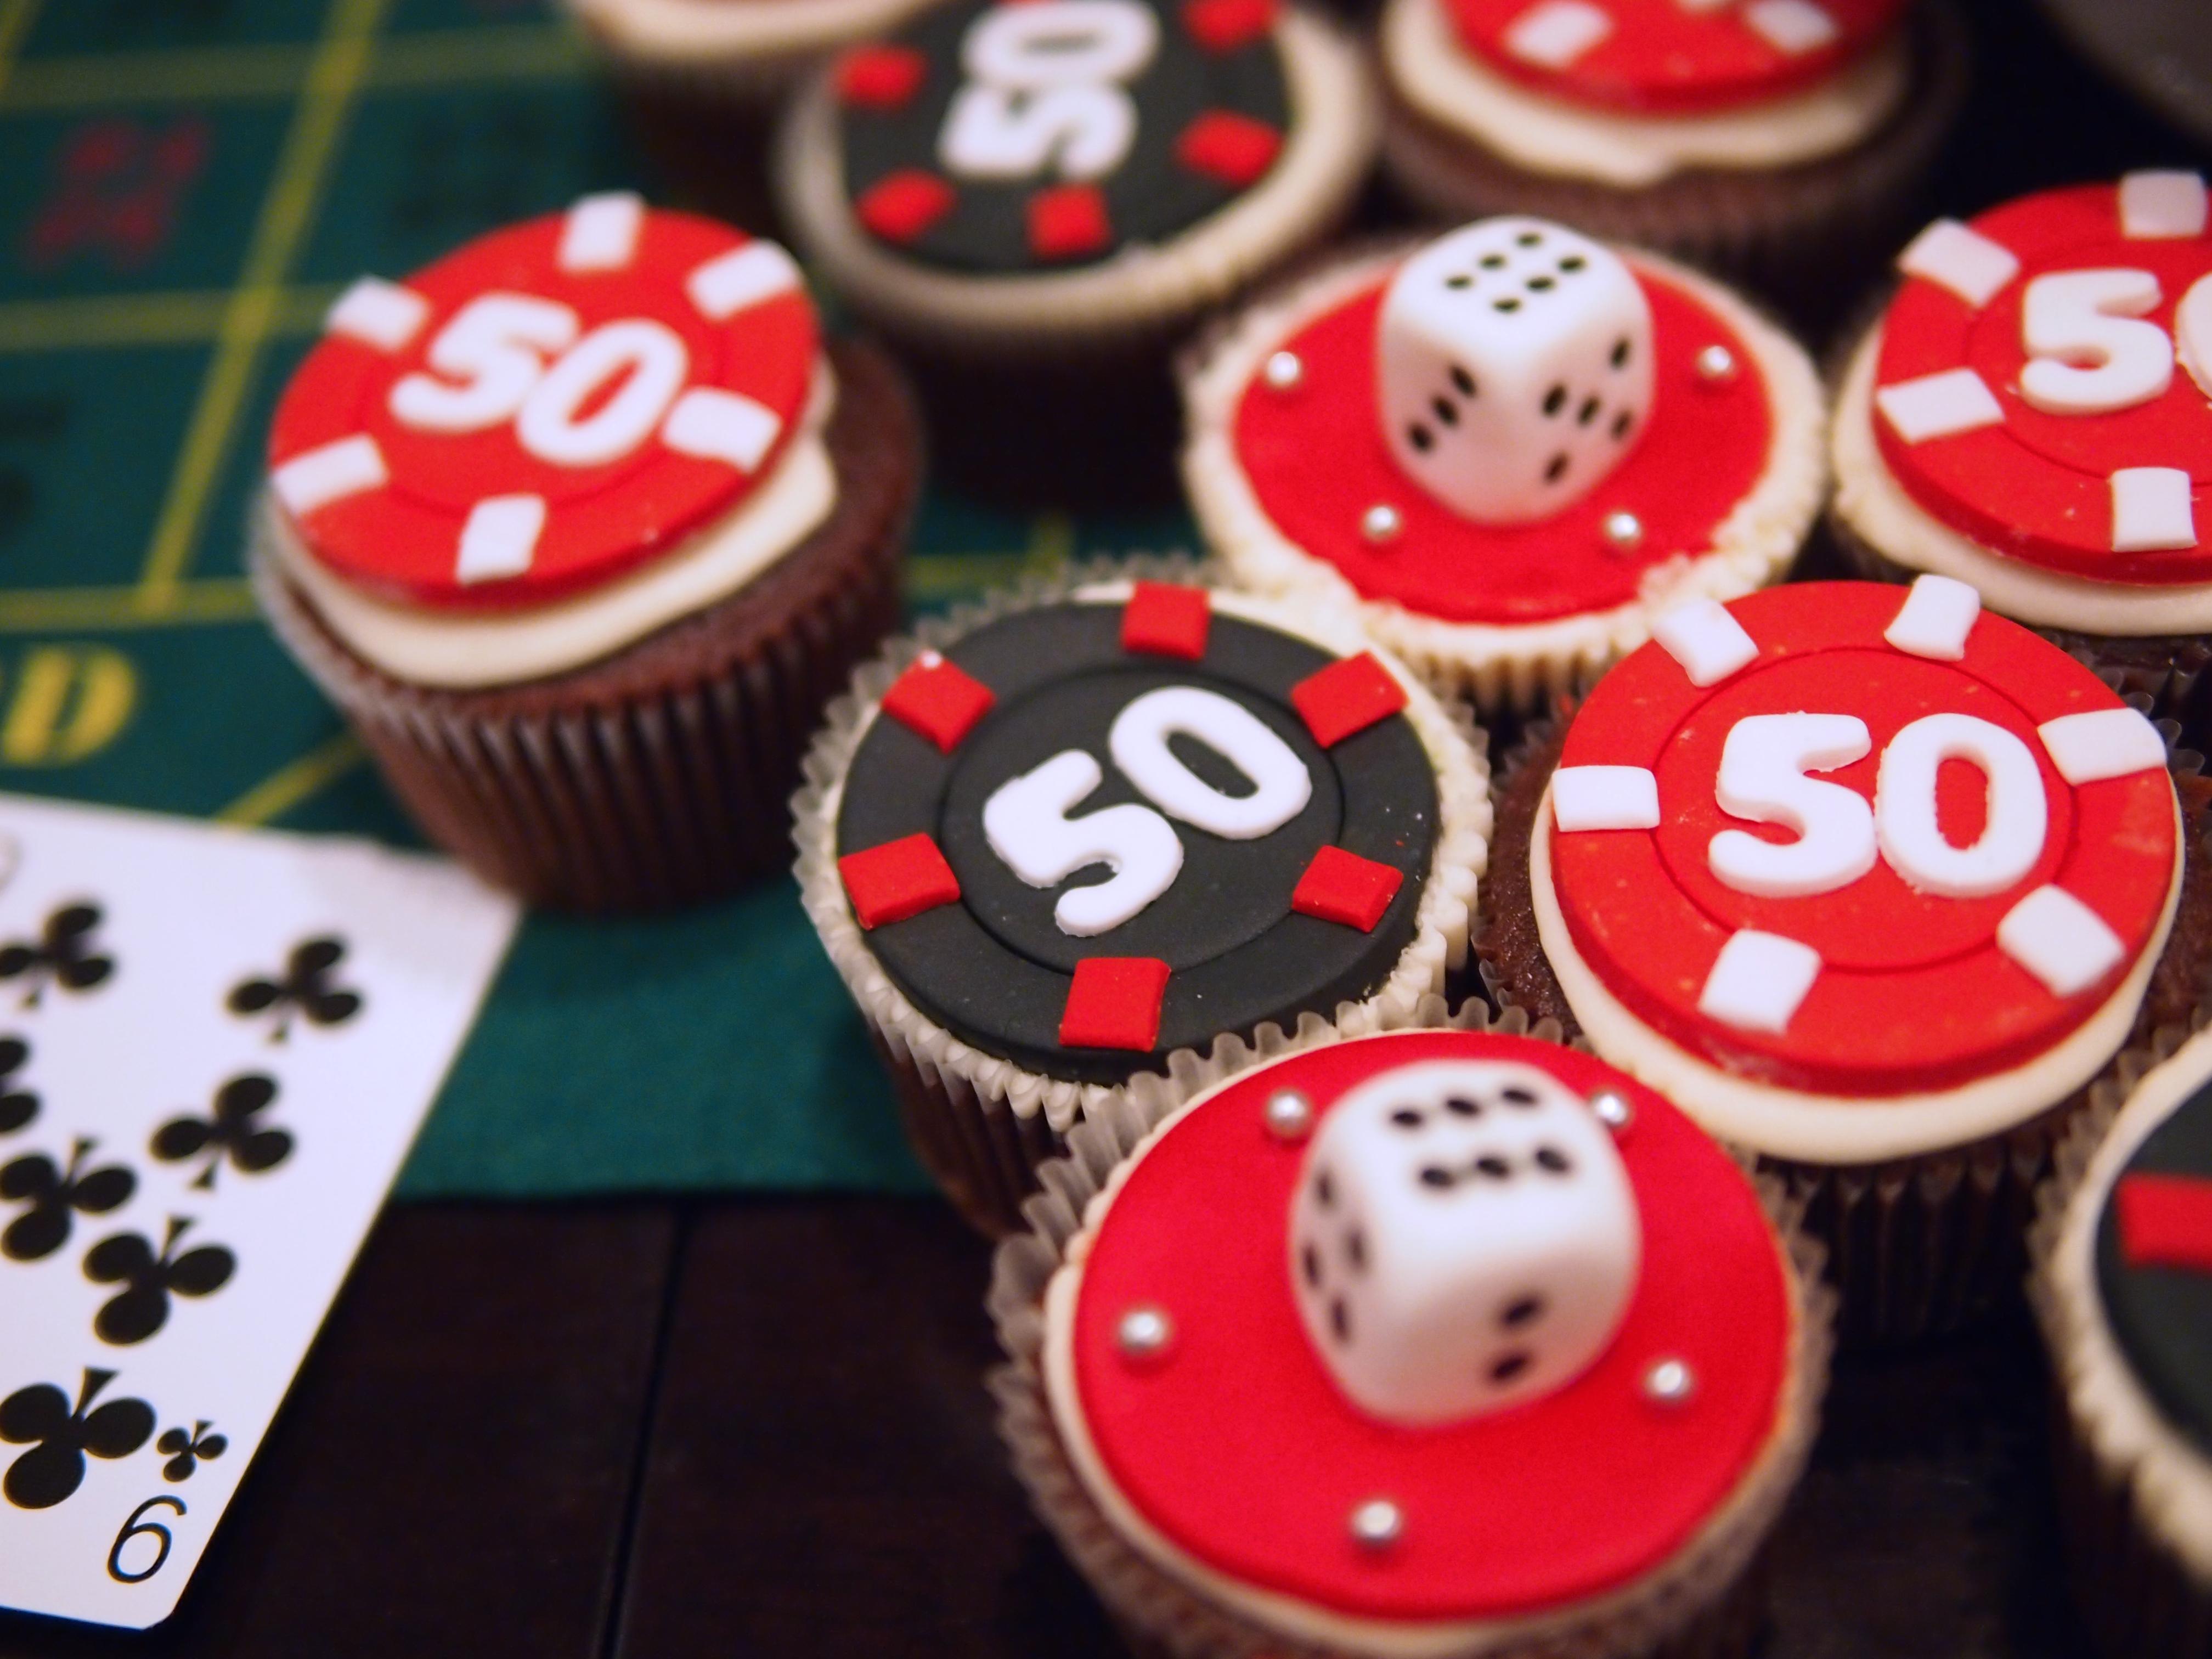 Casino poker royale set 14